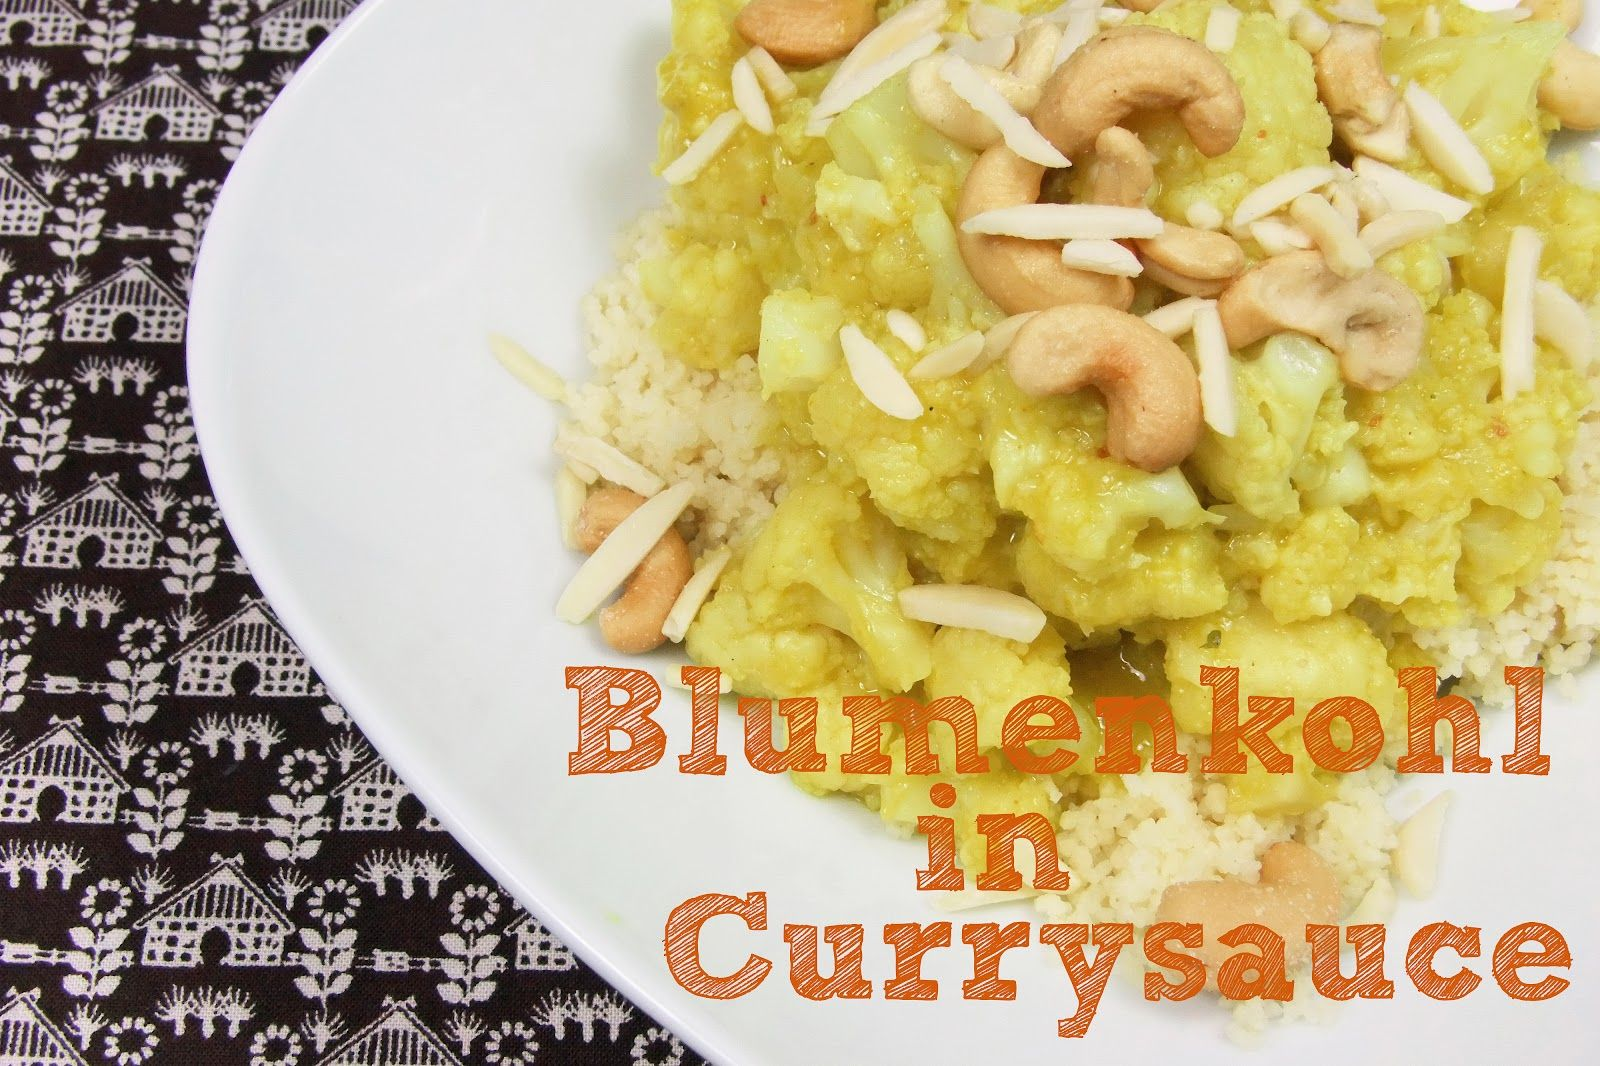 Blumenkohl in Currysauce